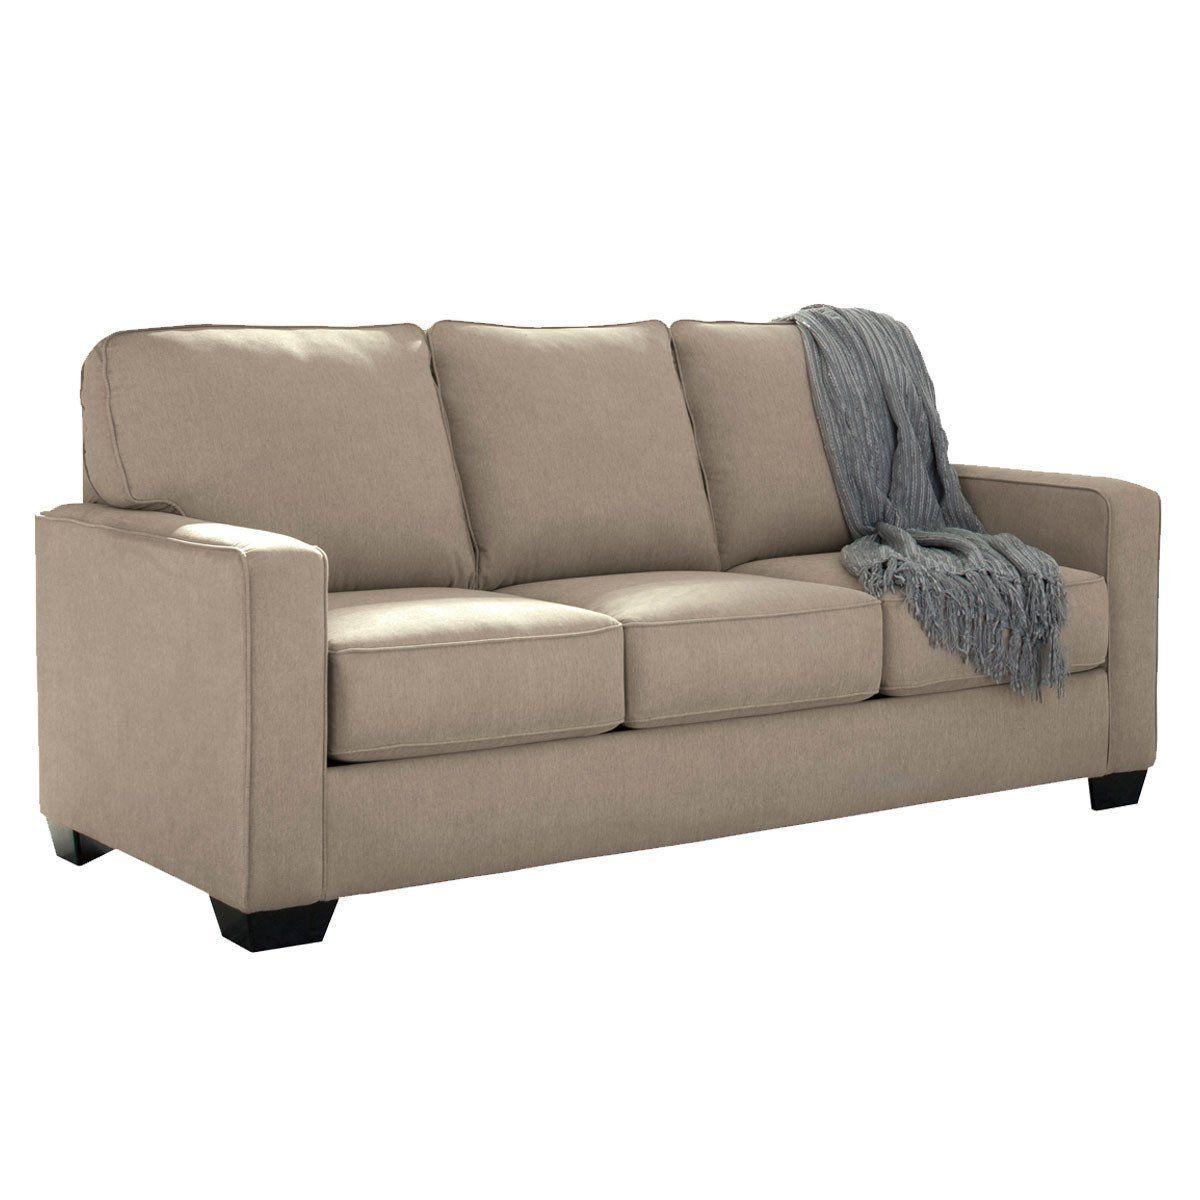 Carl Sleeper Sofa Full Sleeper Sofa Contemporary